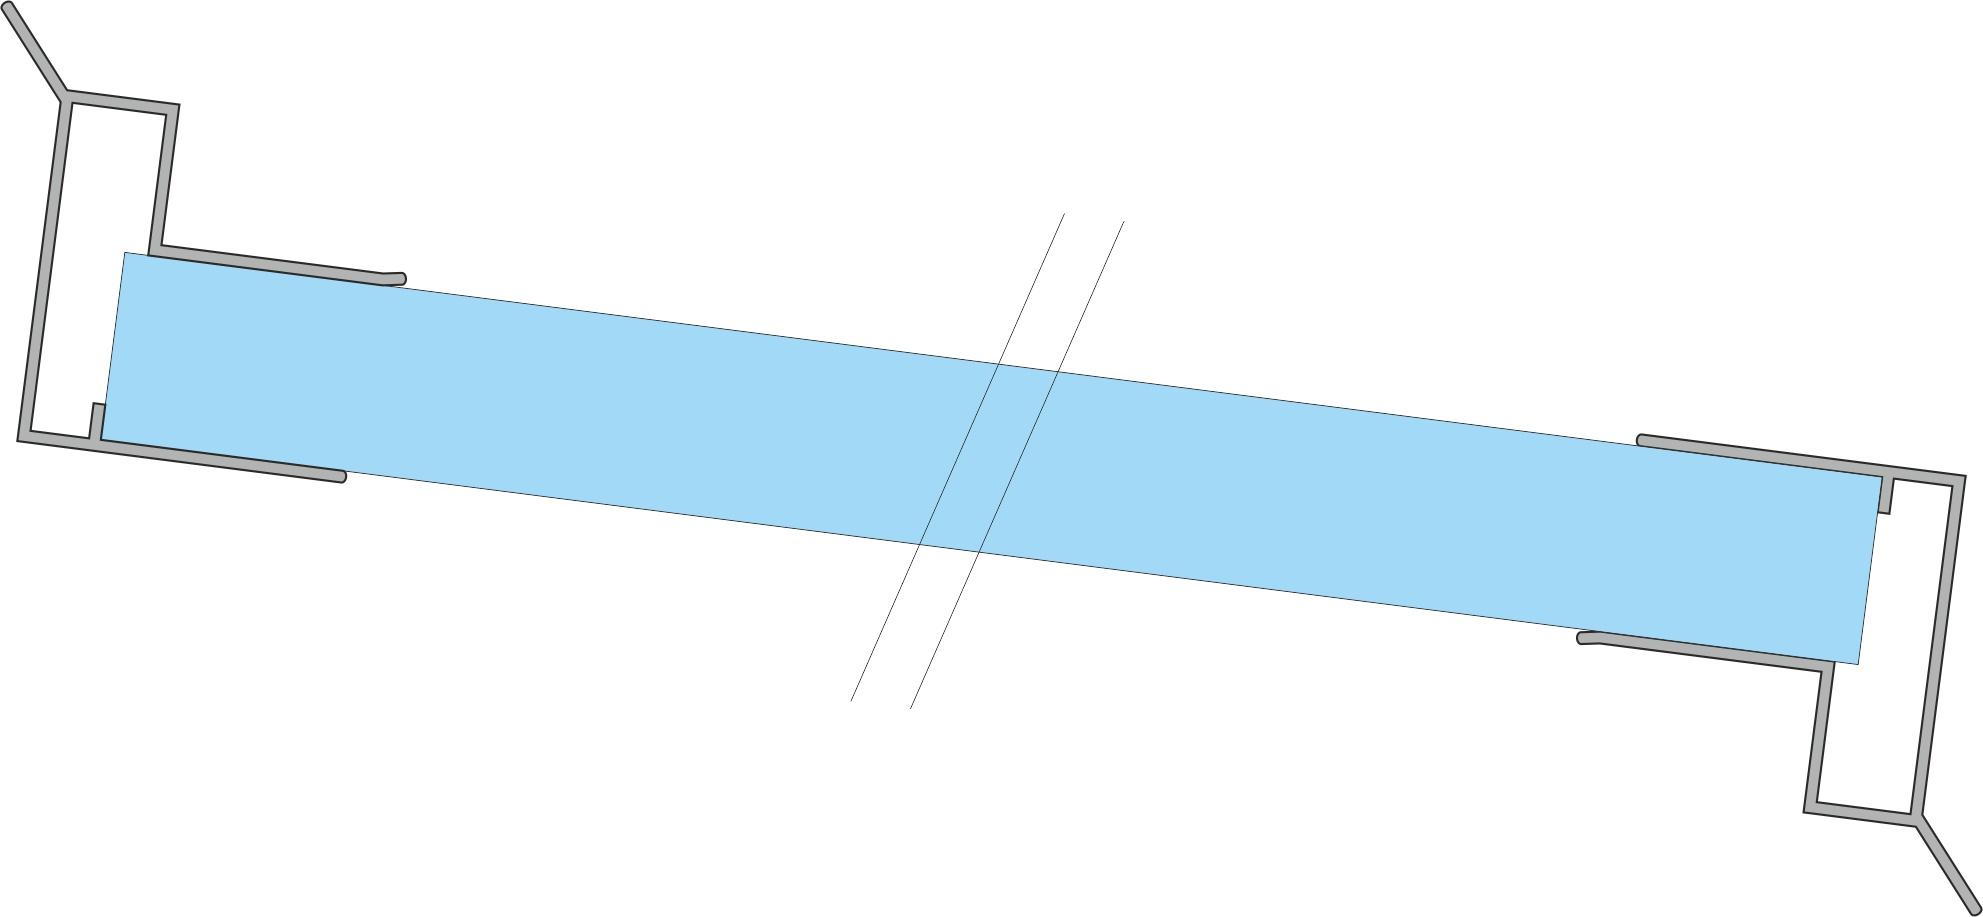 Alu Abschlussprofil große Trpfkante oben unten montiert